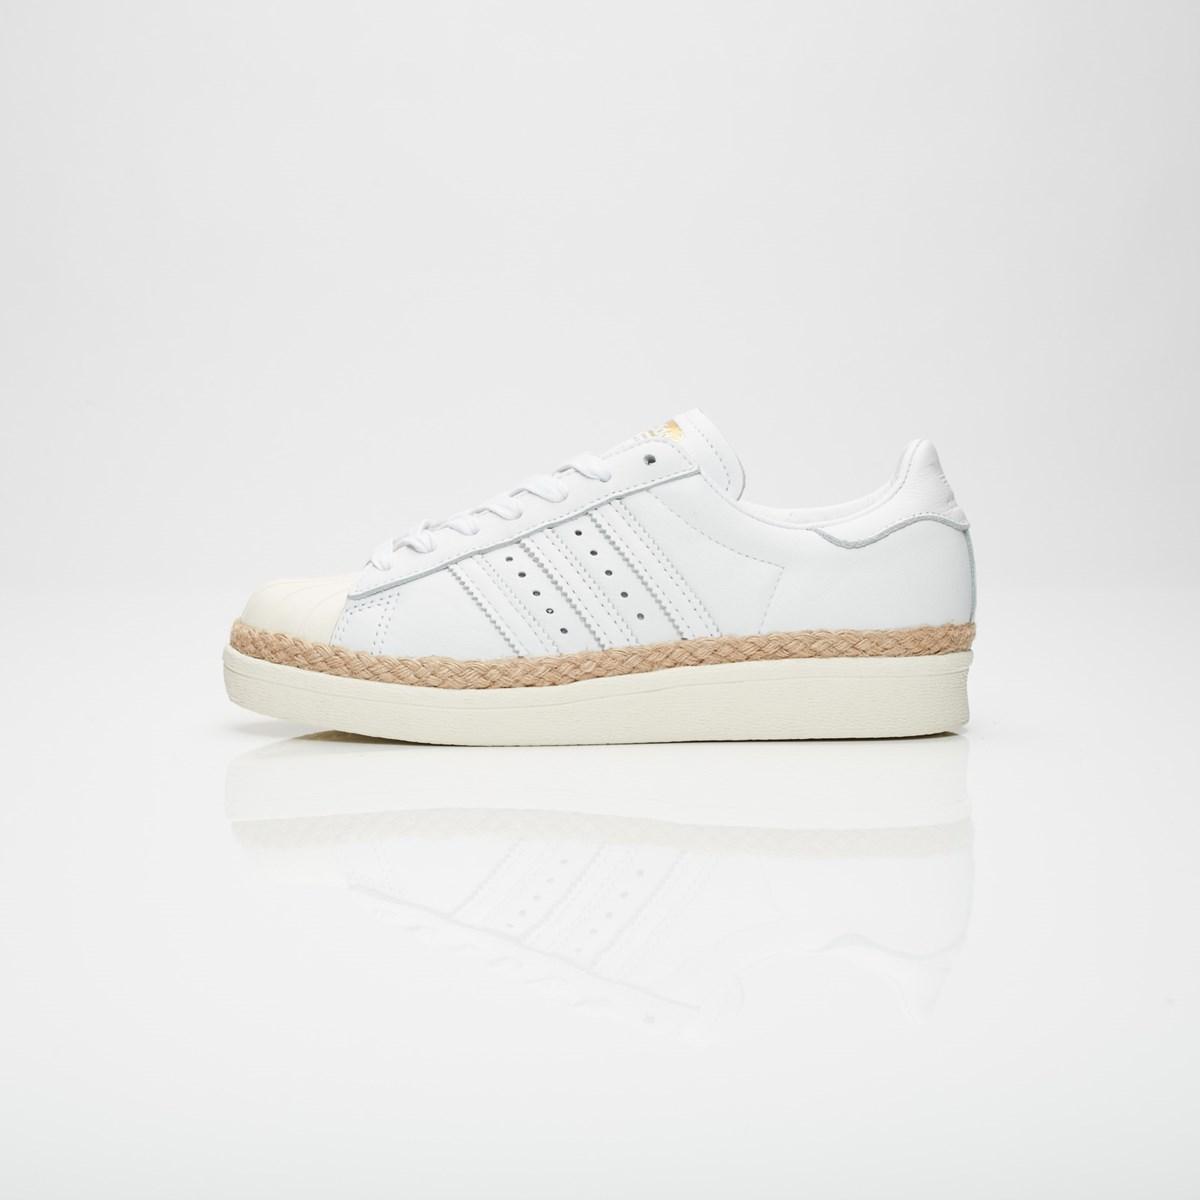 676f181571eb adidas Superstar 80s New Bold Womens - Da9573 - Sneakersnstuff ...